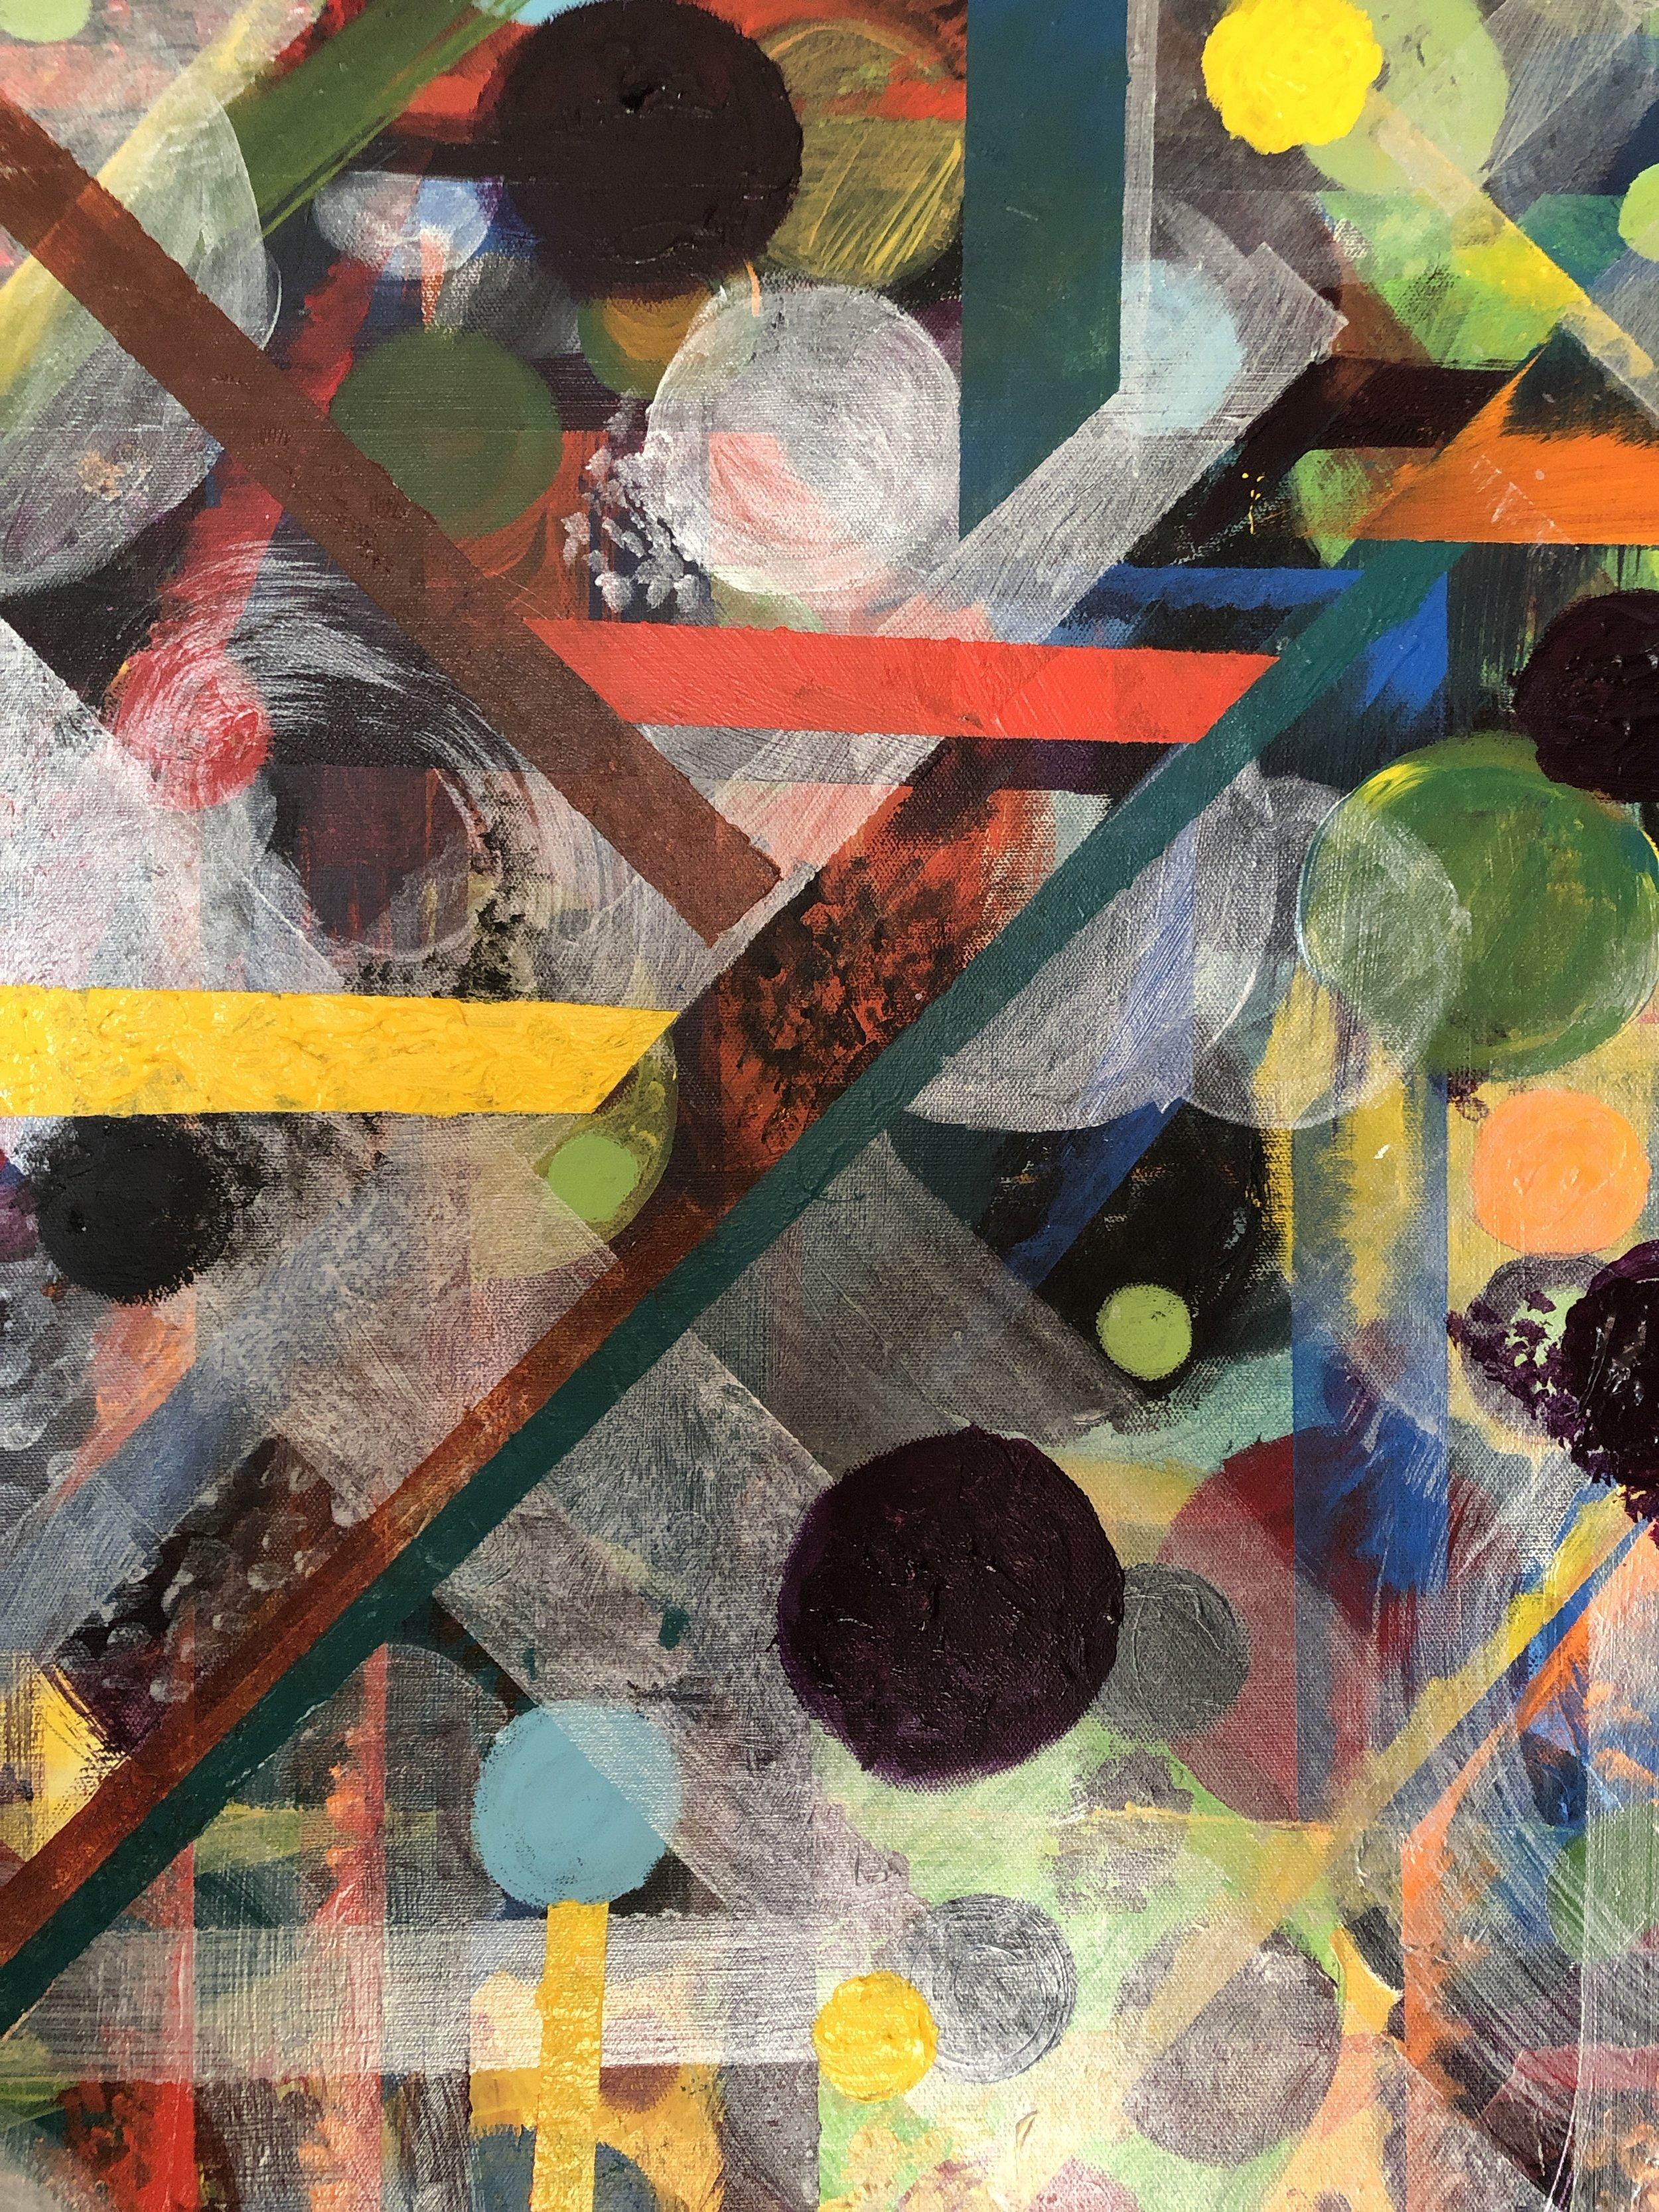 Some of Joseph's artwork